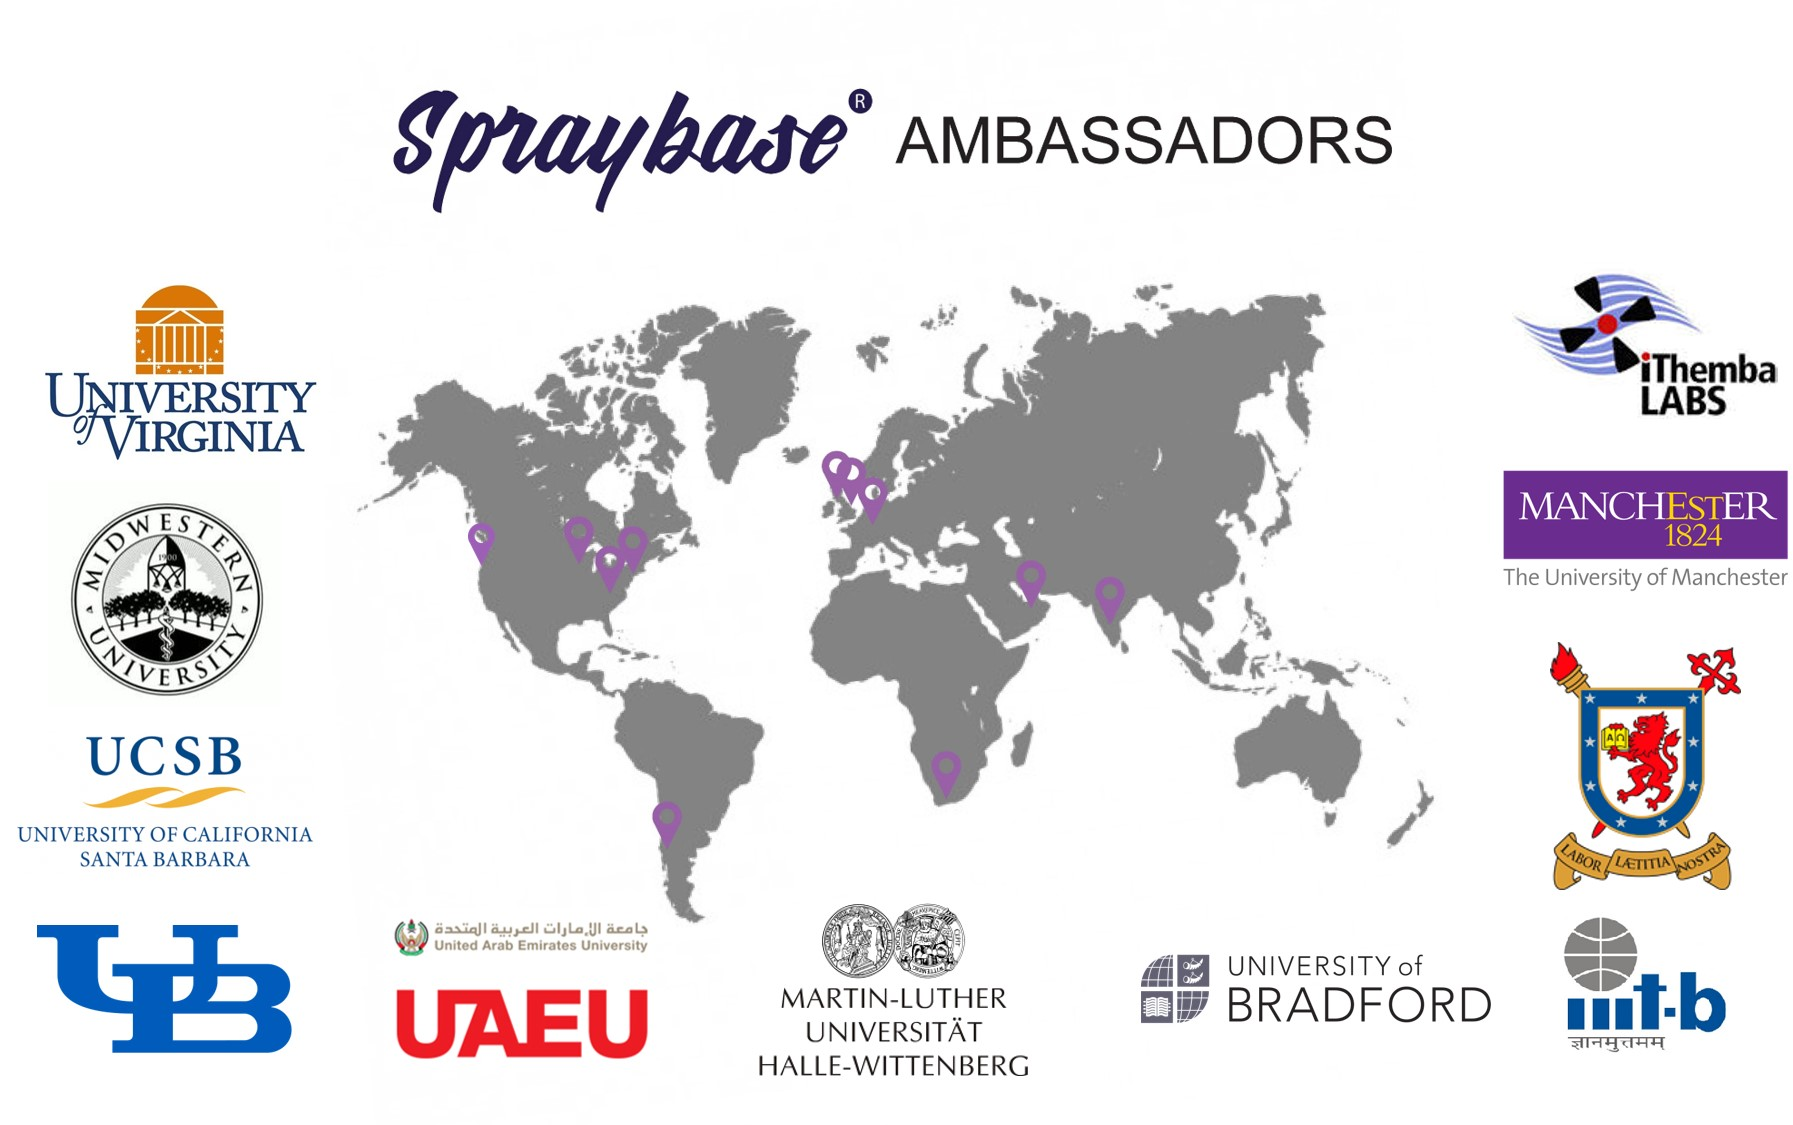 Spraybase Ambassadors 2019.jpg